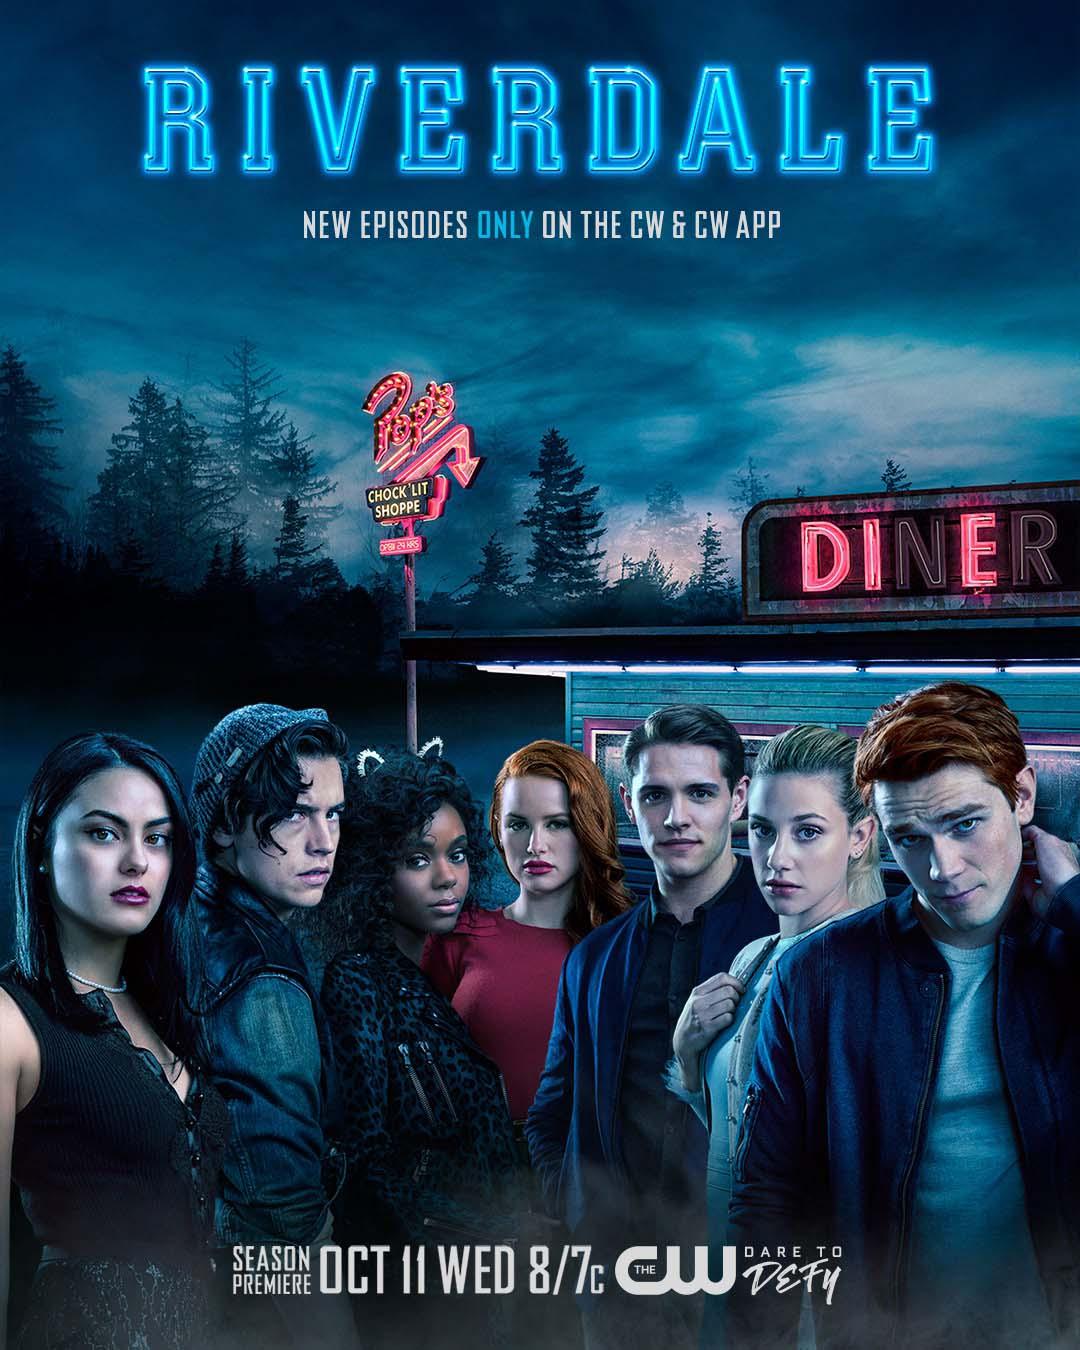 Riverdale Saison 3 Episode 21 Streaming Vf : riverdale, saison, episode, streaming, Riverdale, Saison, AlloCiné